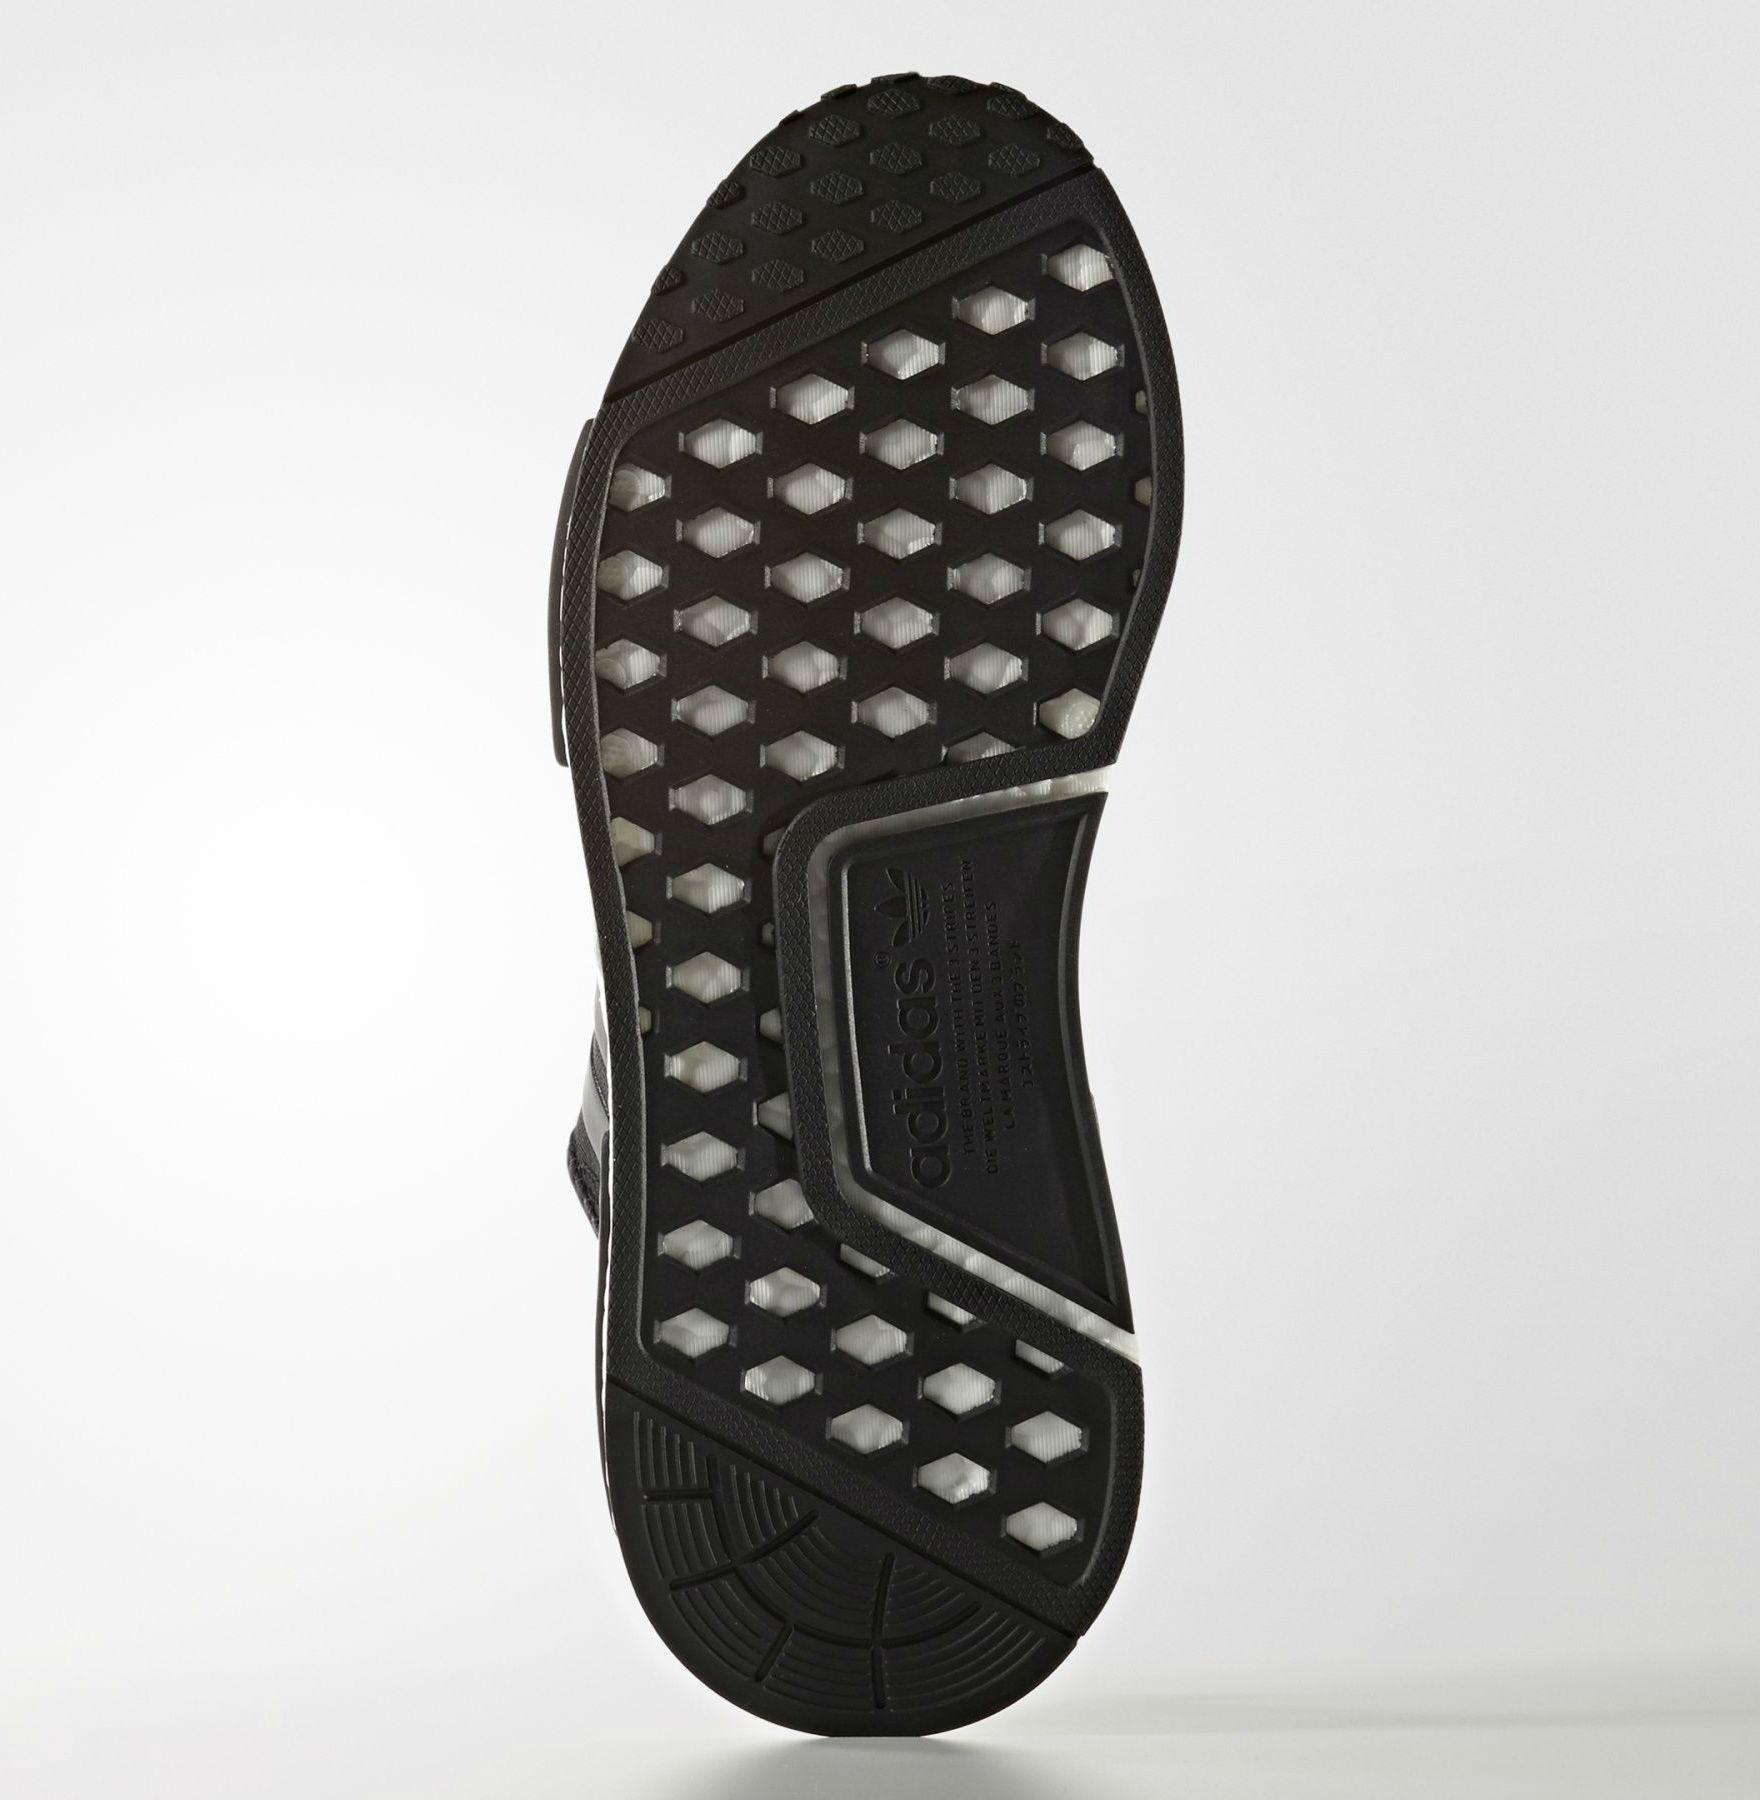 adidas NMD Black Cargo Sole BA7251